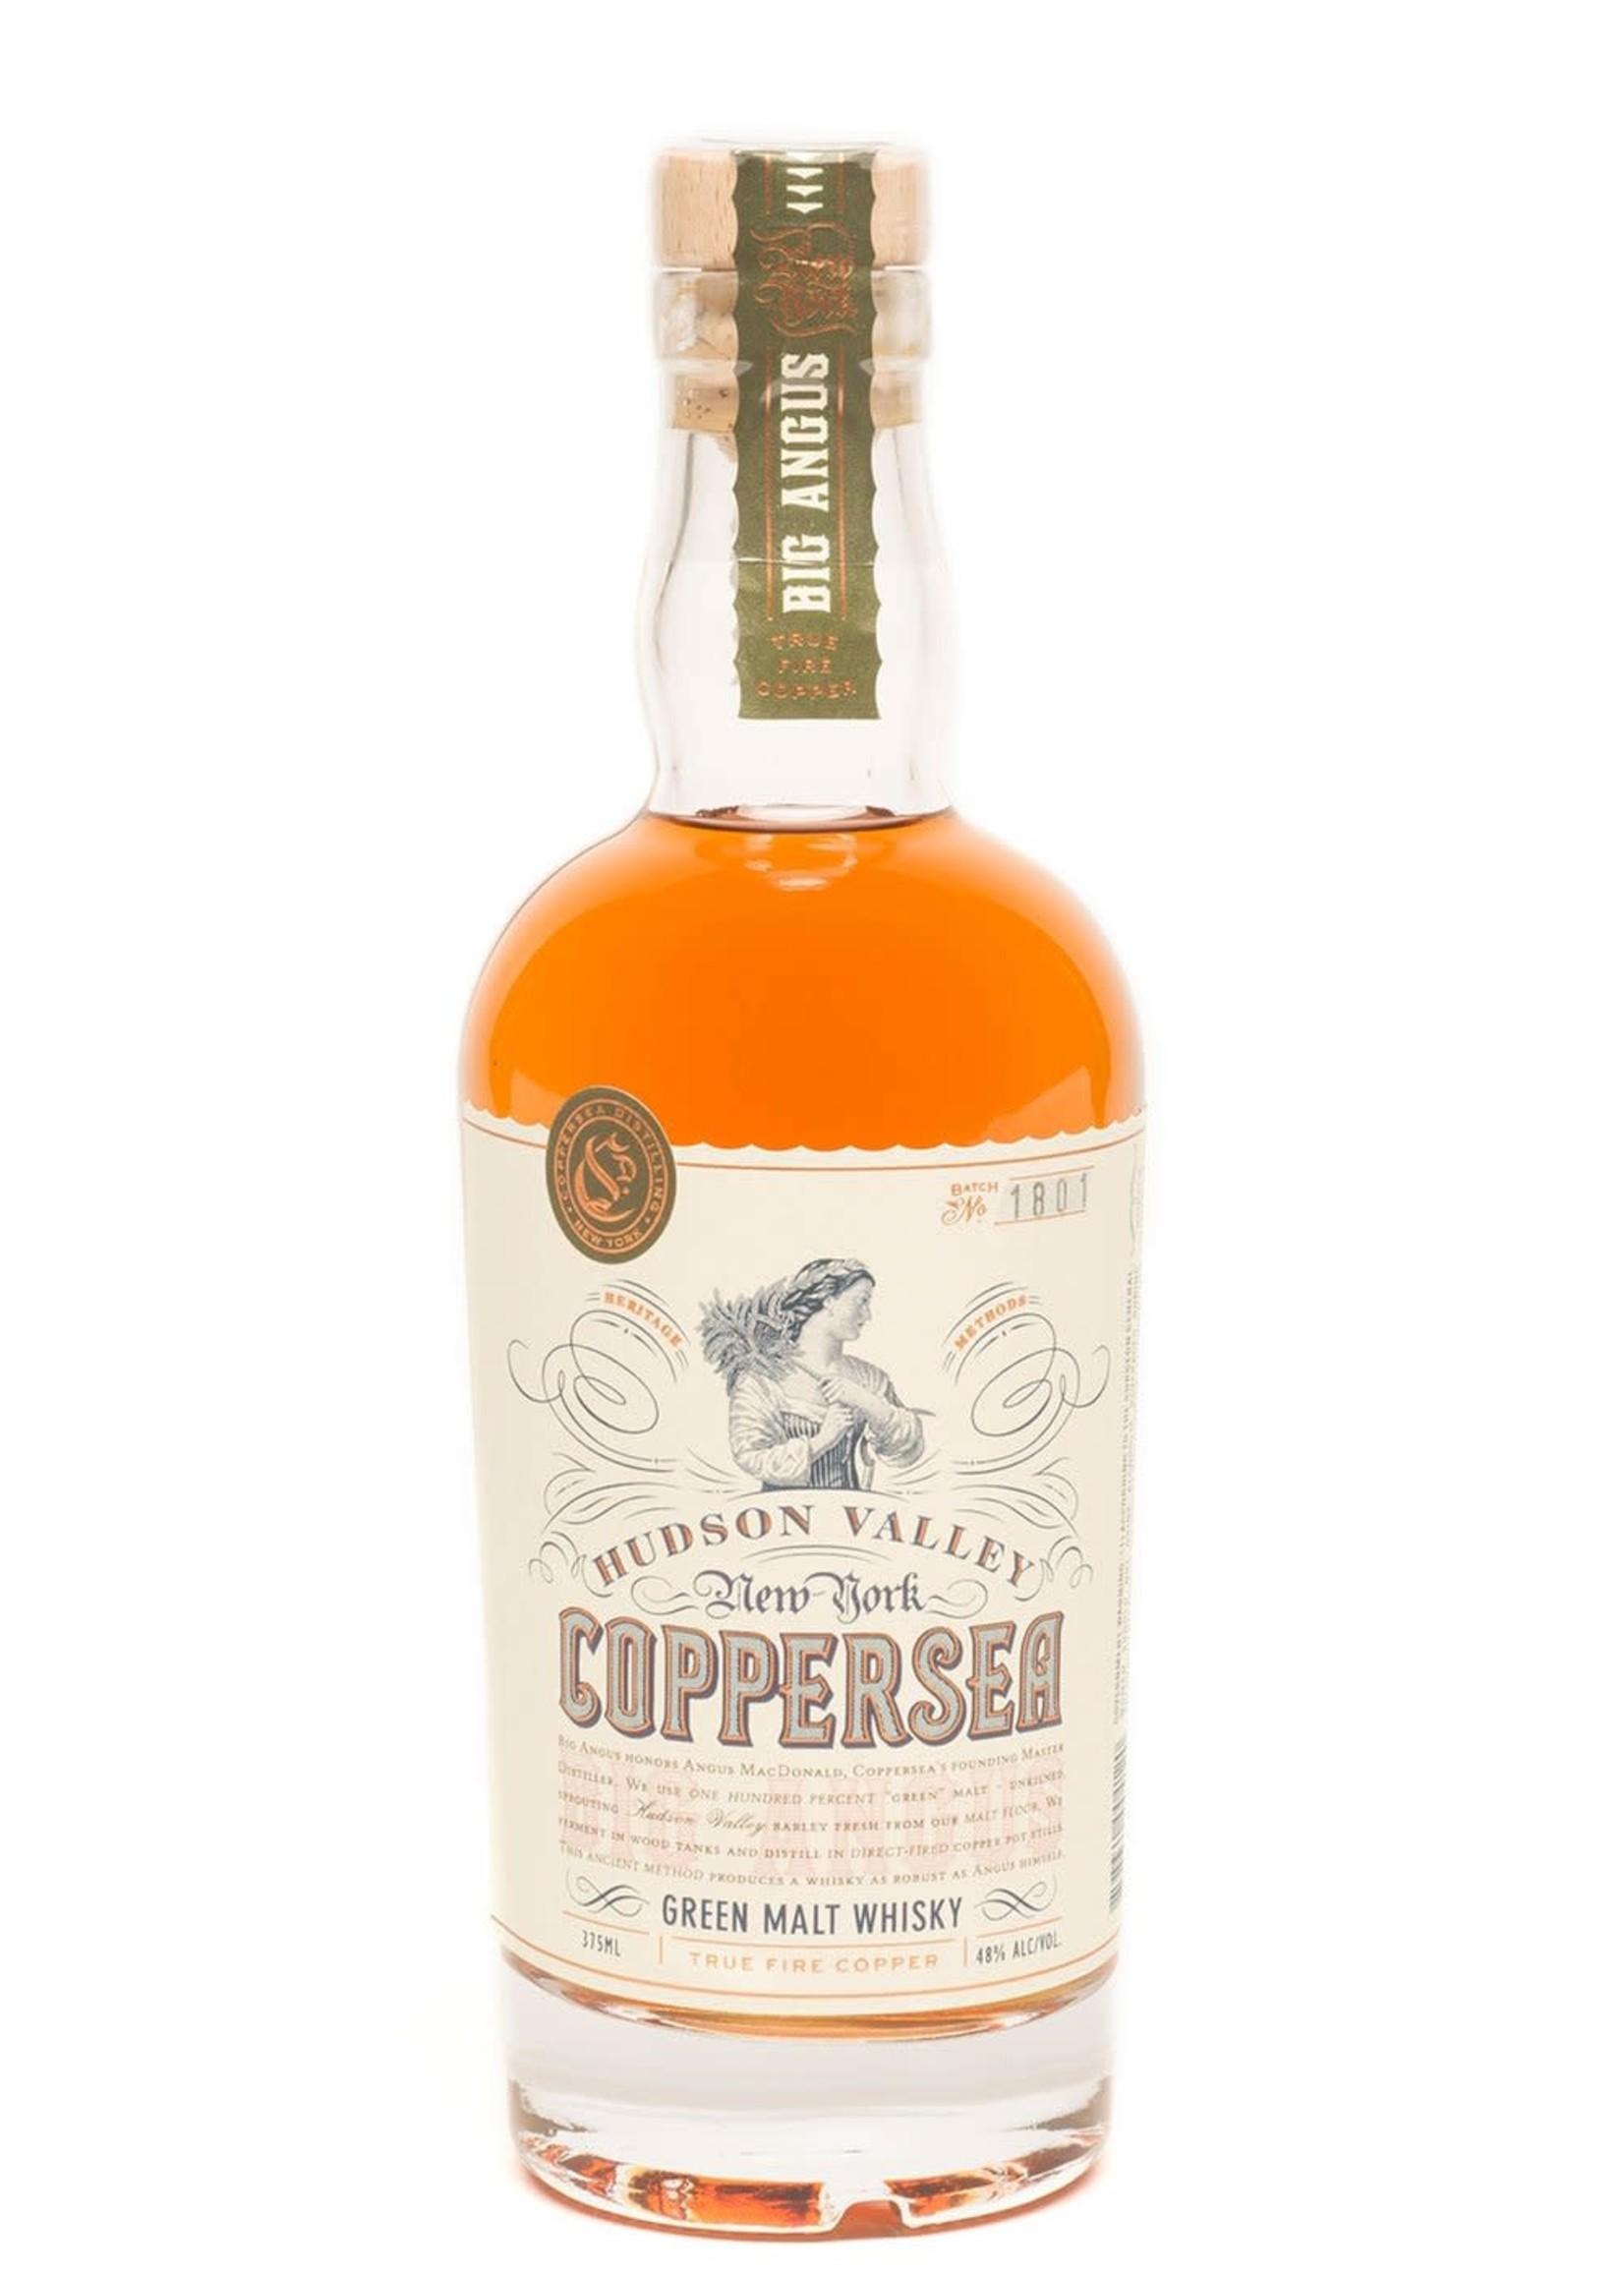 Coppersea Coppersea / Big Angus Green Malt Whiskey / 375mL